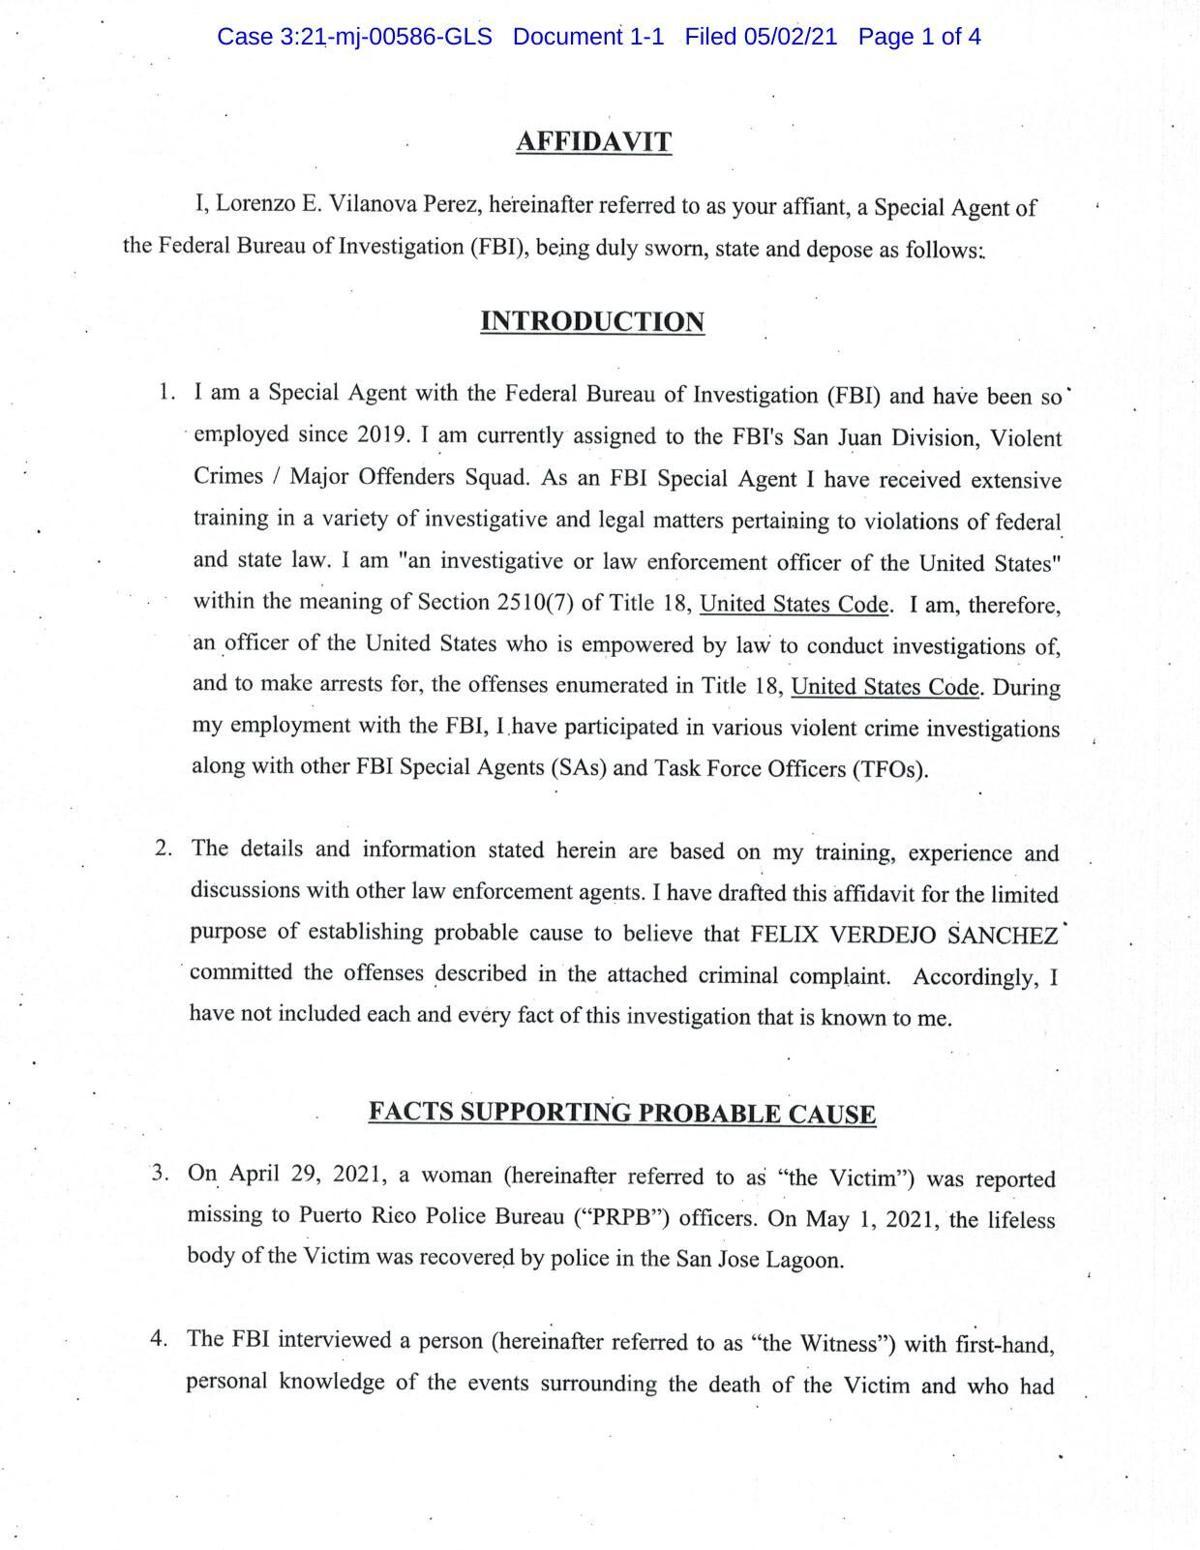 Denuncia contra Félix Verdejo